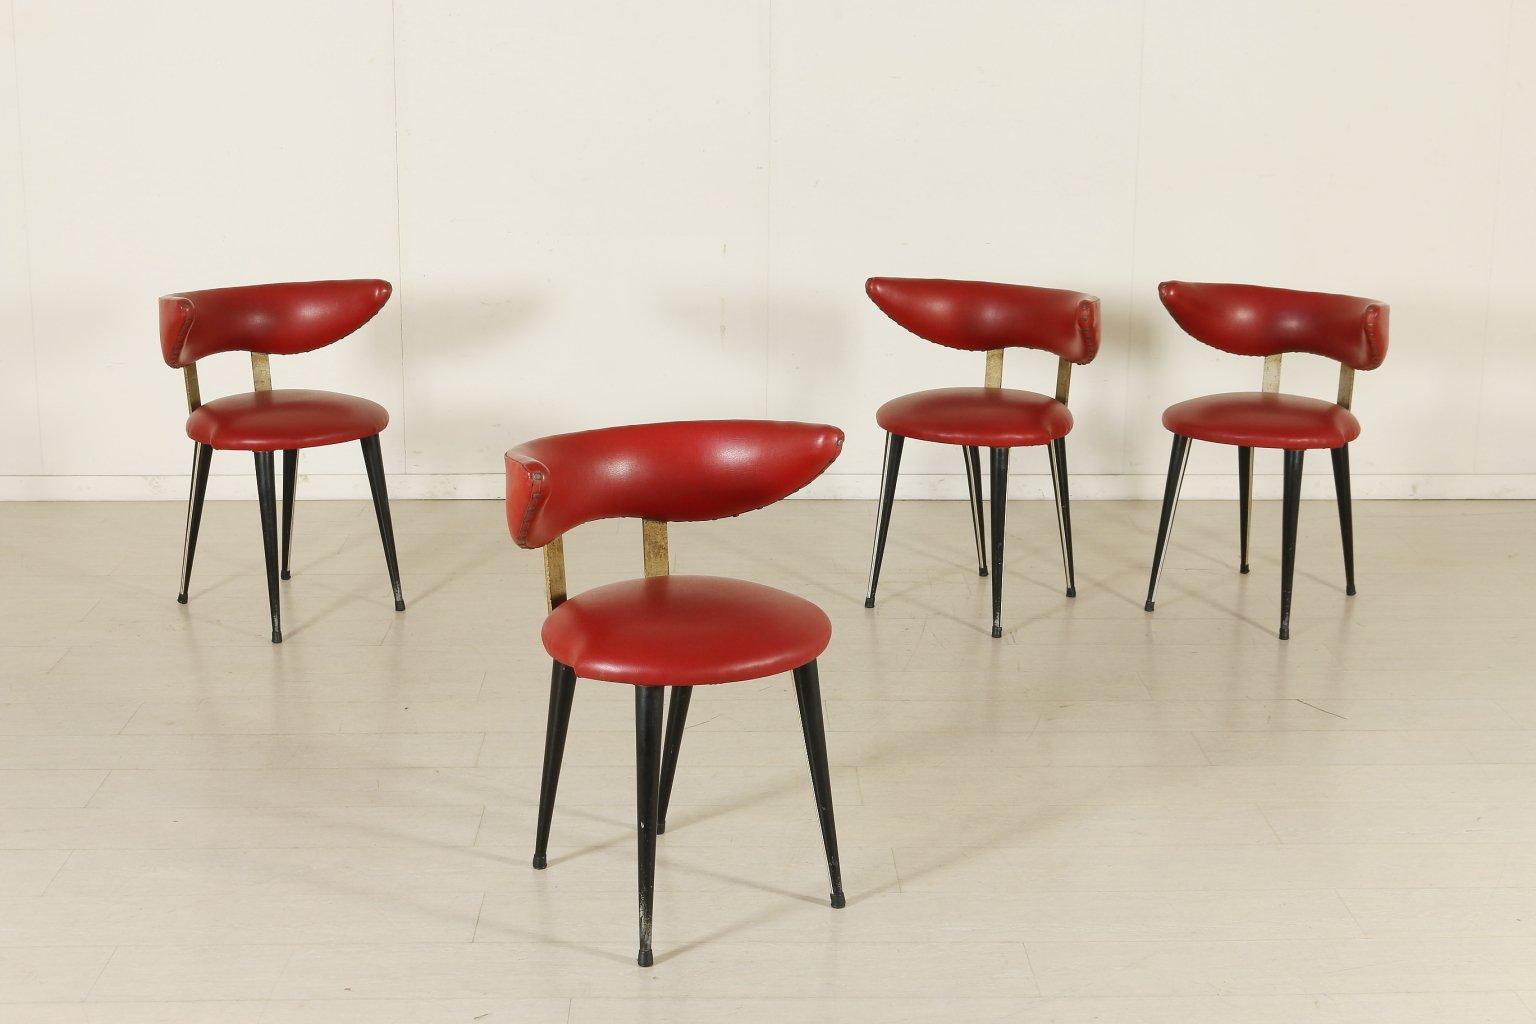 italienische st hle aus aluminium kunstleder und lackiertem holz 1950er 4er set bei pamono kaufen. Black Bedroom Furniture Sets. Home Design Ideas